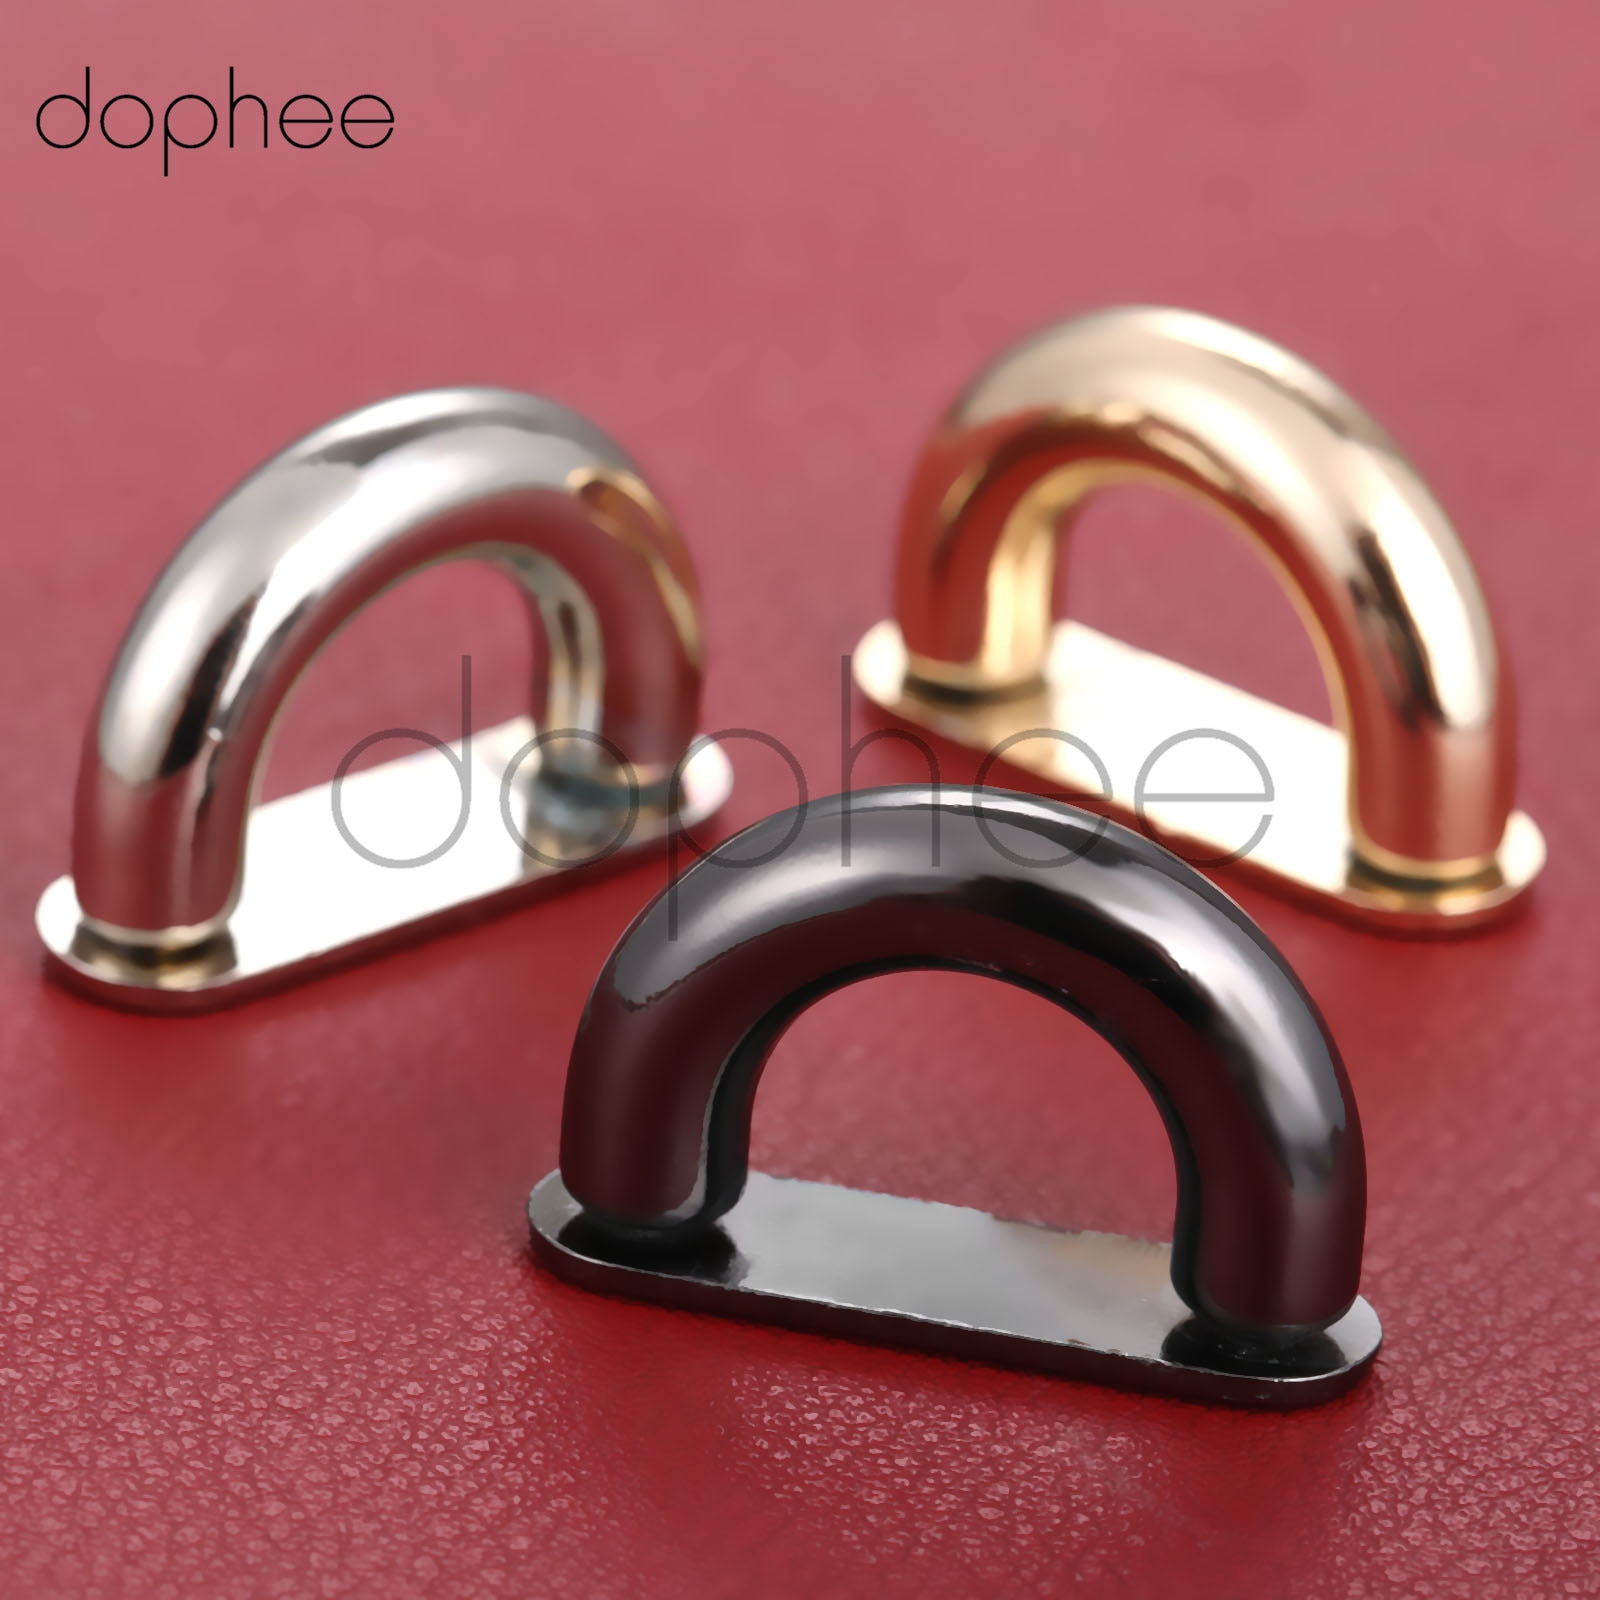 dophee 2pcs  4colors Inside width 13mm DIY handbag/bag silver metal accessories bridge connector hanger